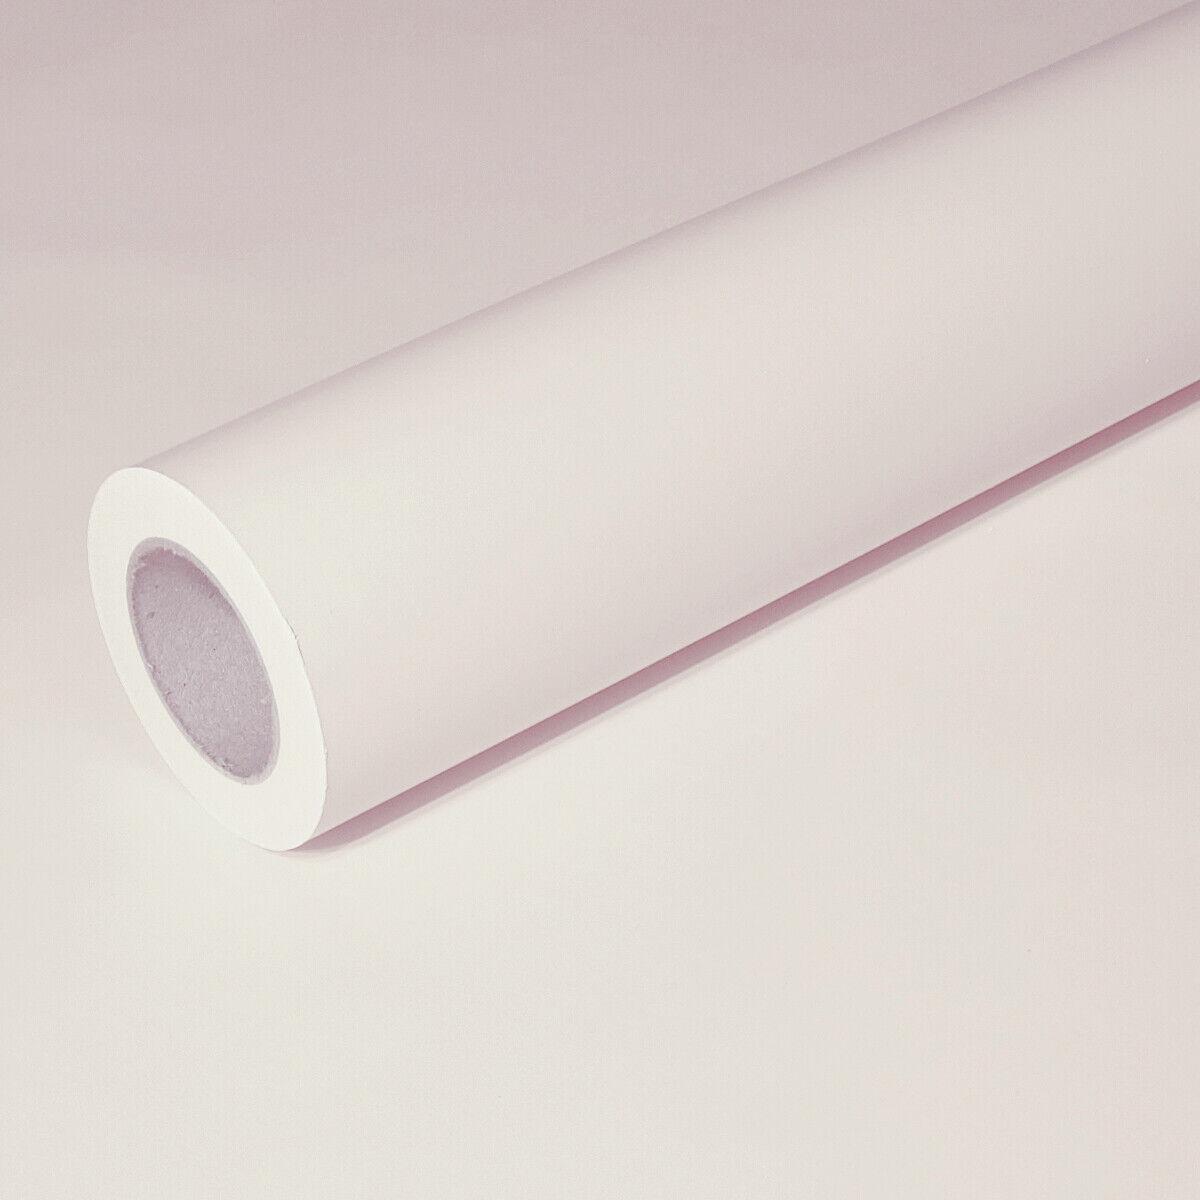 0,50 /m² 50m x 0,75m marfil beige junopax regalo de papel resistente a la intemperie mojado fijo